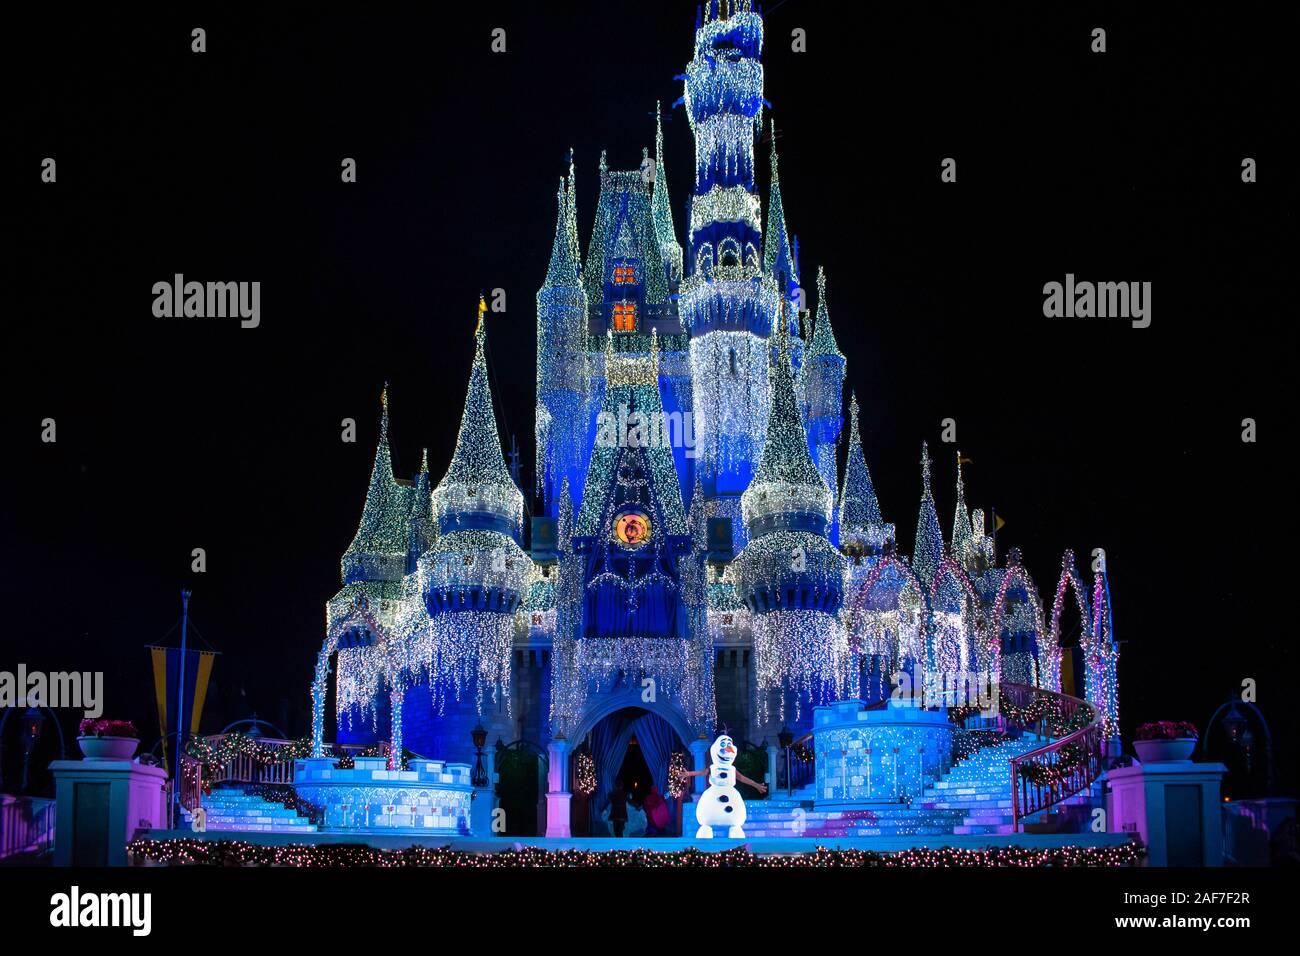 orlando florida november 15 2019 illuminated cinderella castle in christmas season at magic kingdom 2AF7F2R